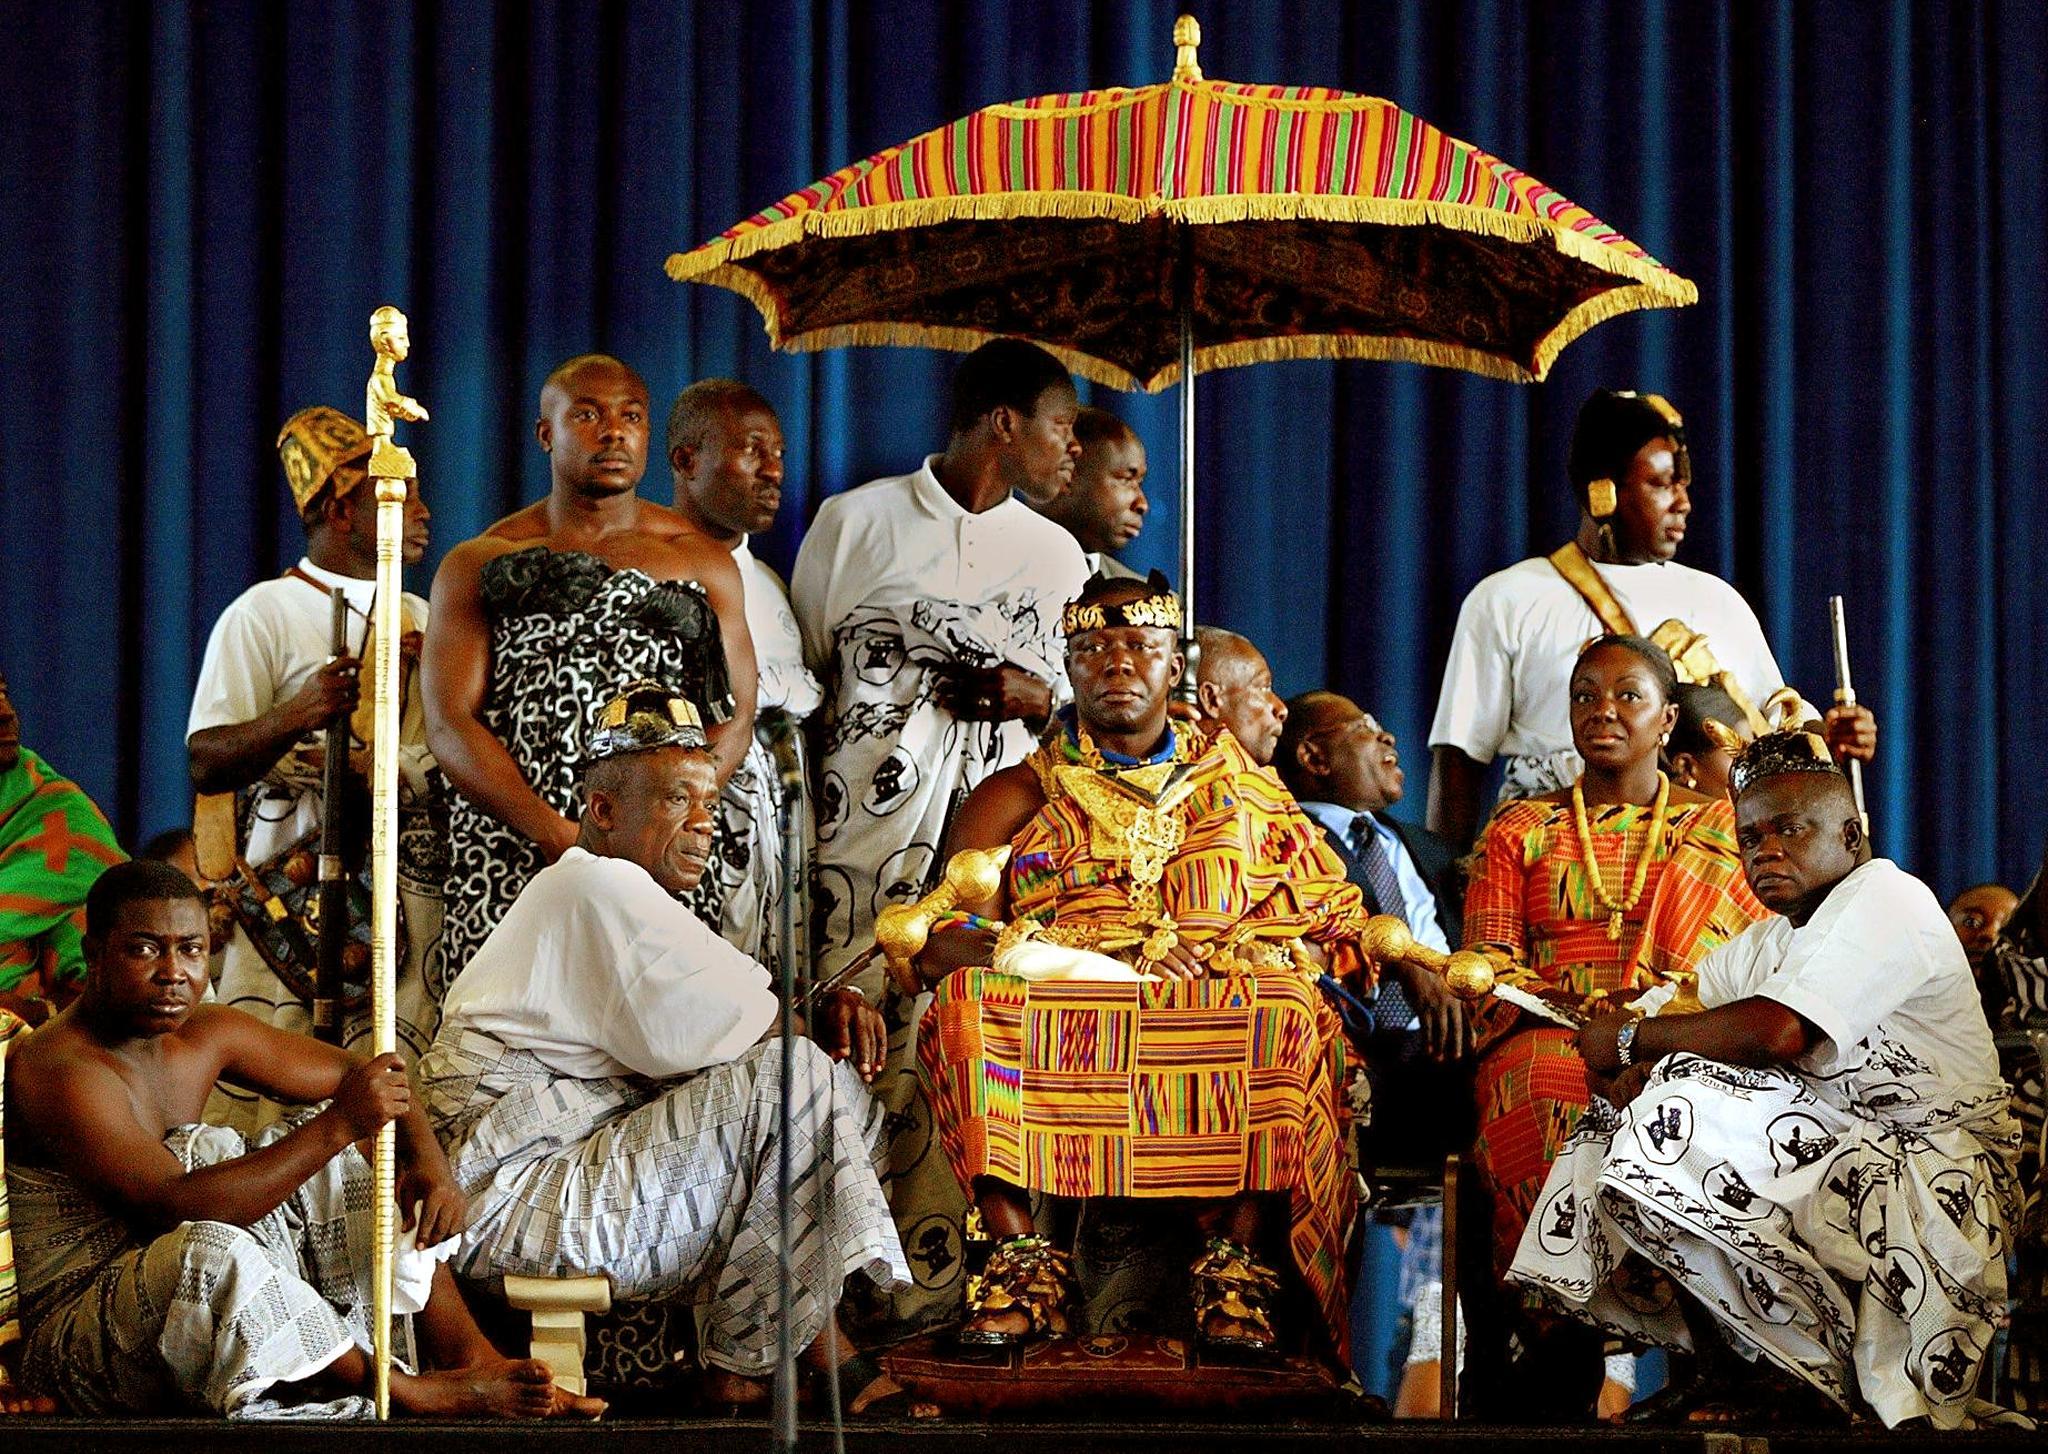 Ghana: Asantehene Otumfuo Osei Tutu II  – 20 years on the Royal Stool